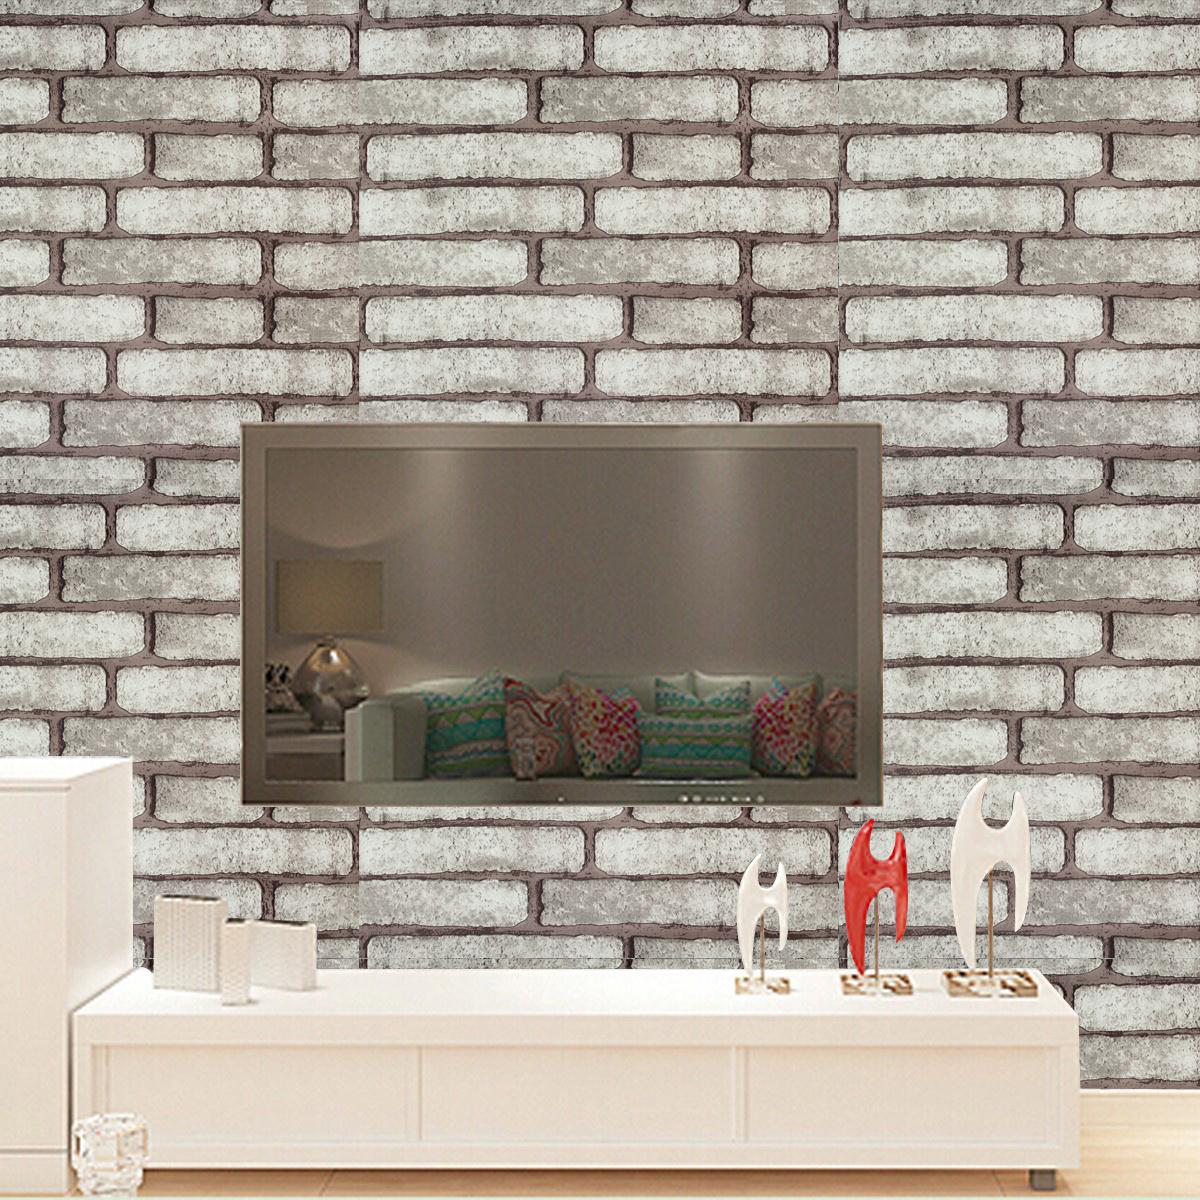 10m 3d wallpaper faux brick stone self adhesive waterproof - Fake brick wall decoration ...